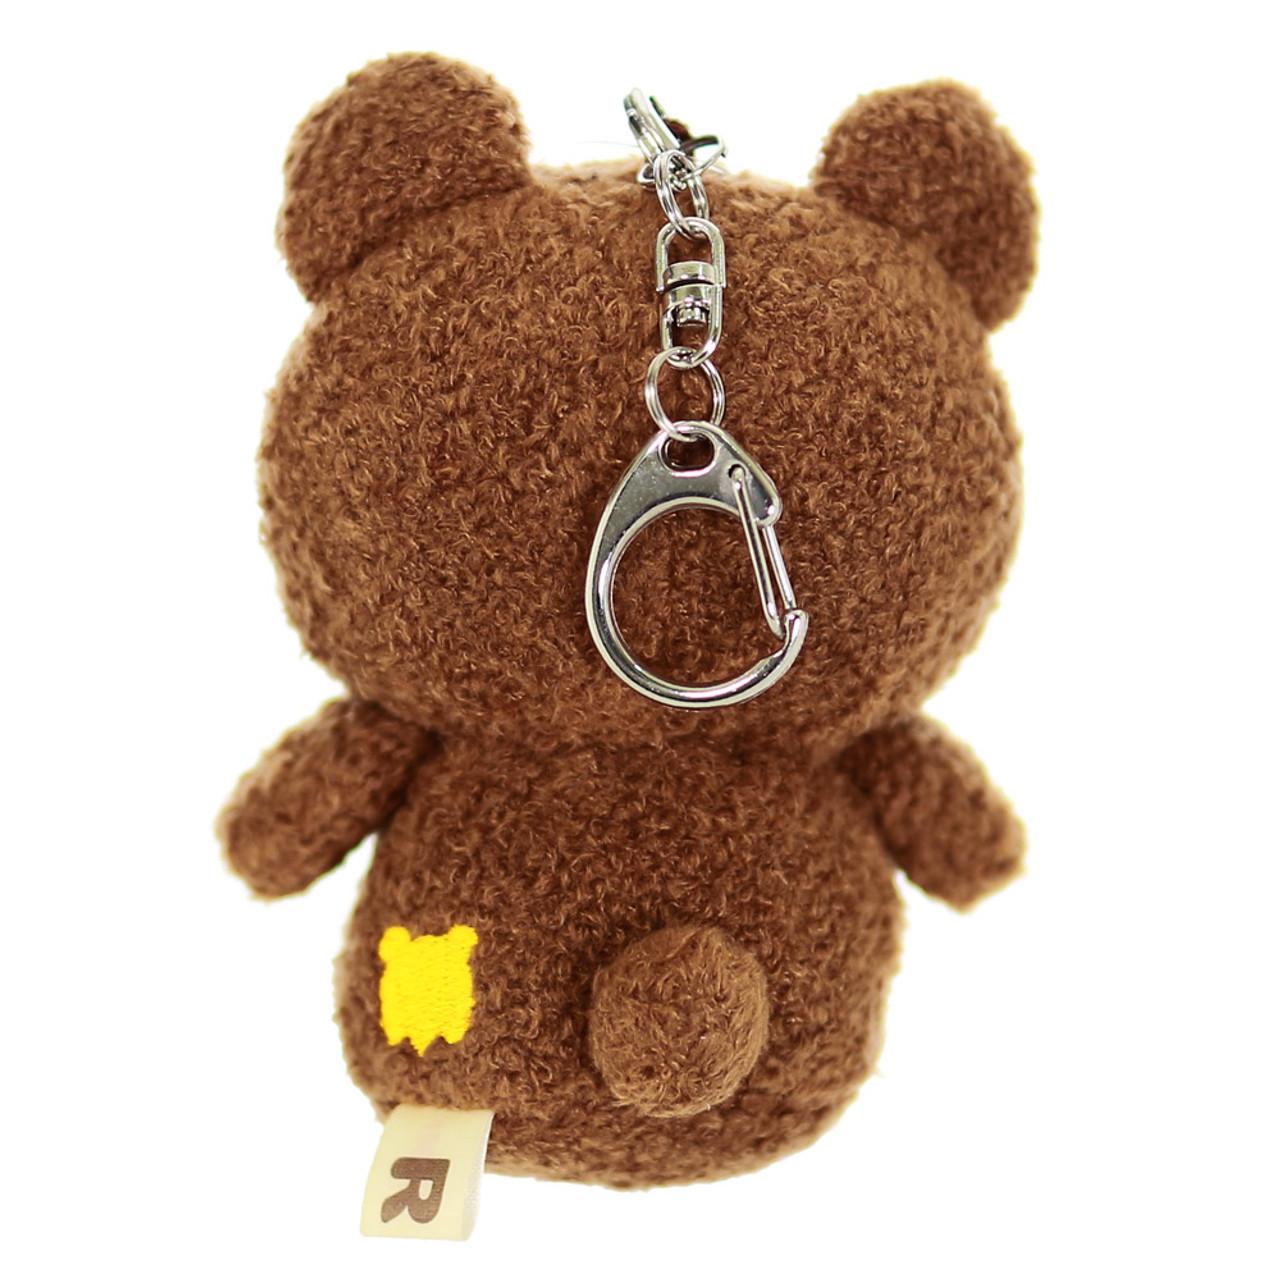 San-x Cute Chairoikoguma Curly Plush Keychain charm ( Back View With Buckle )